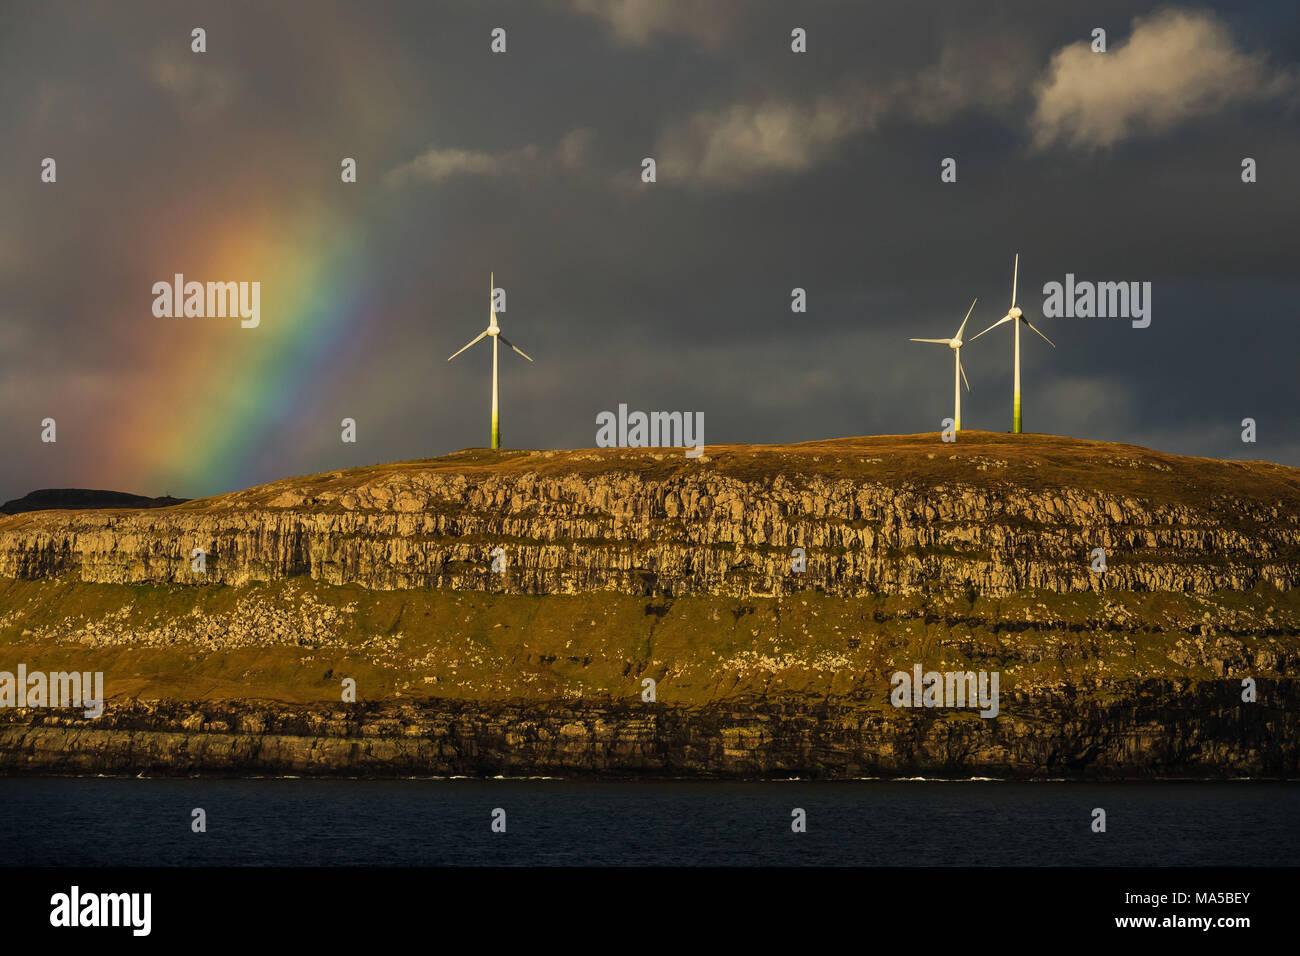 Große Windkraftanlagen, Färöer Inseln Stockbild